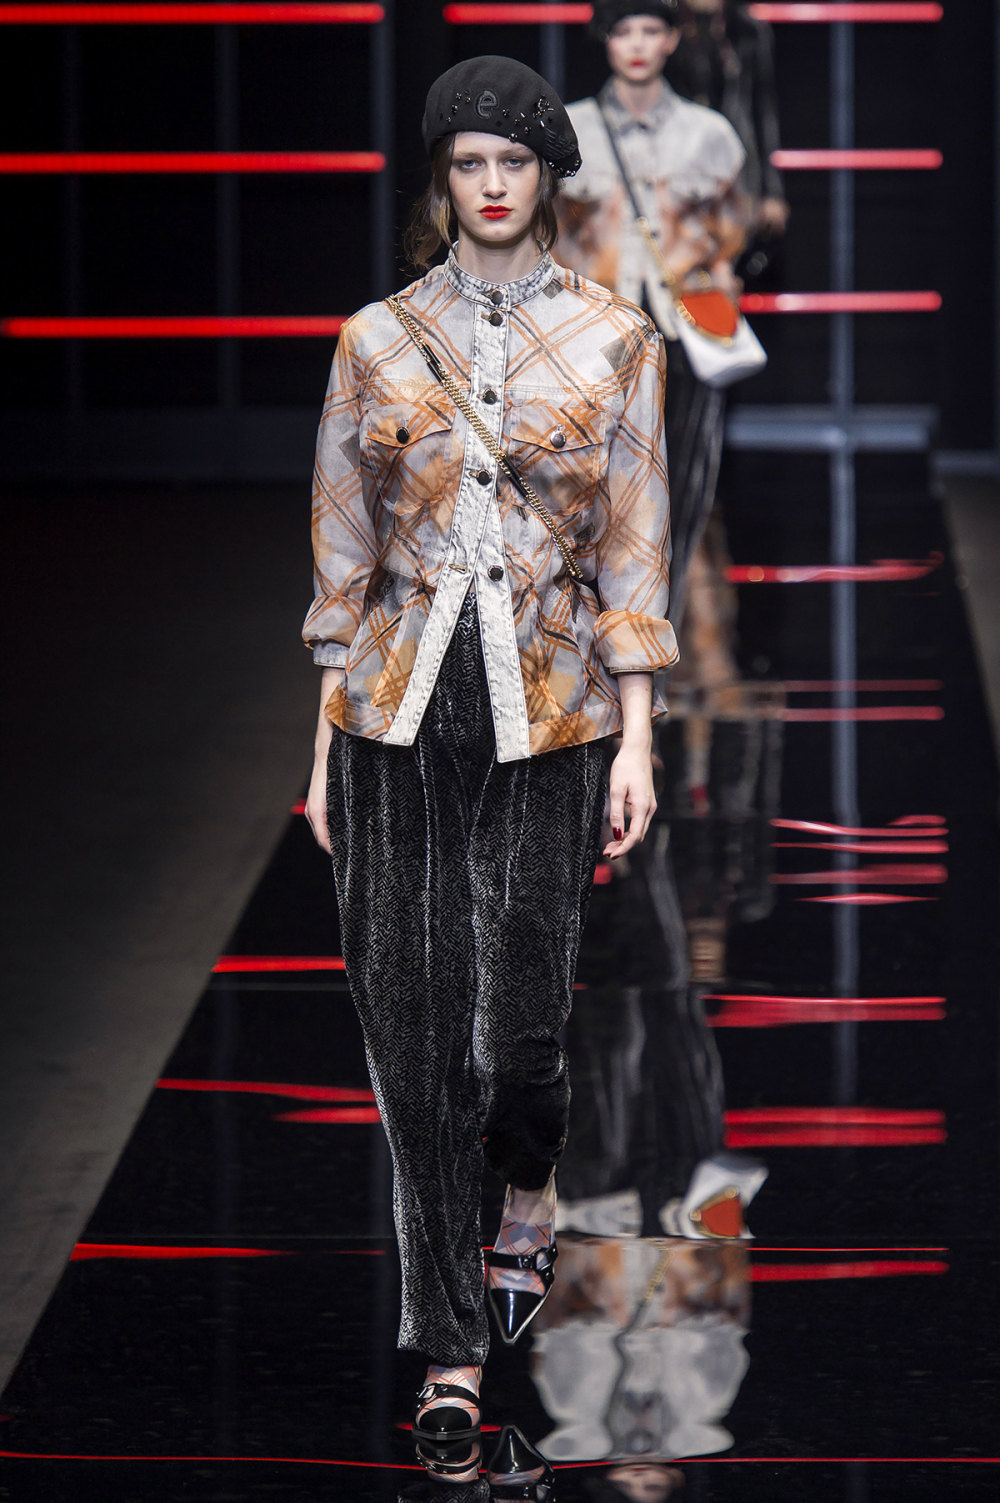 Emporio Armani时装系列畅的裤子带有柔滑裙子的鸡尾酒礼服-11.jpg